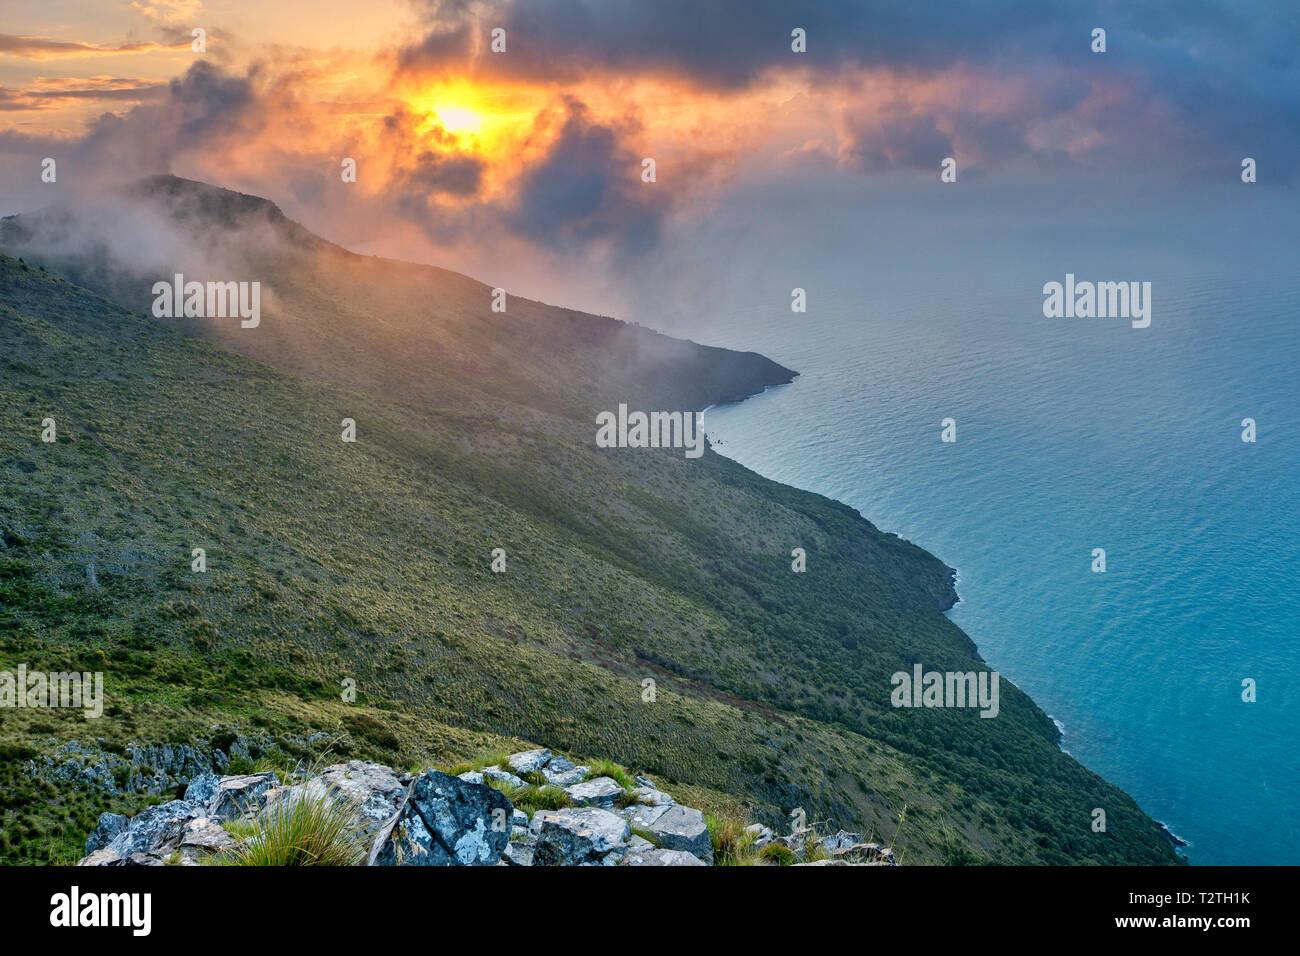 Italy, Campania, Cilento National Park,  Masseta and Infreschi Marine protected area, Policastro Gulf, sunrise - Stock Image